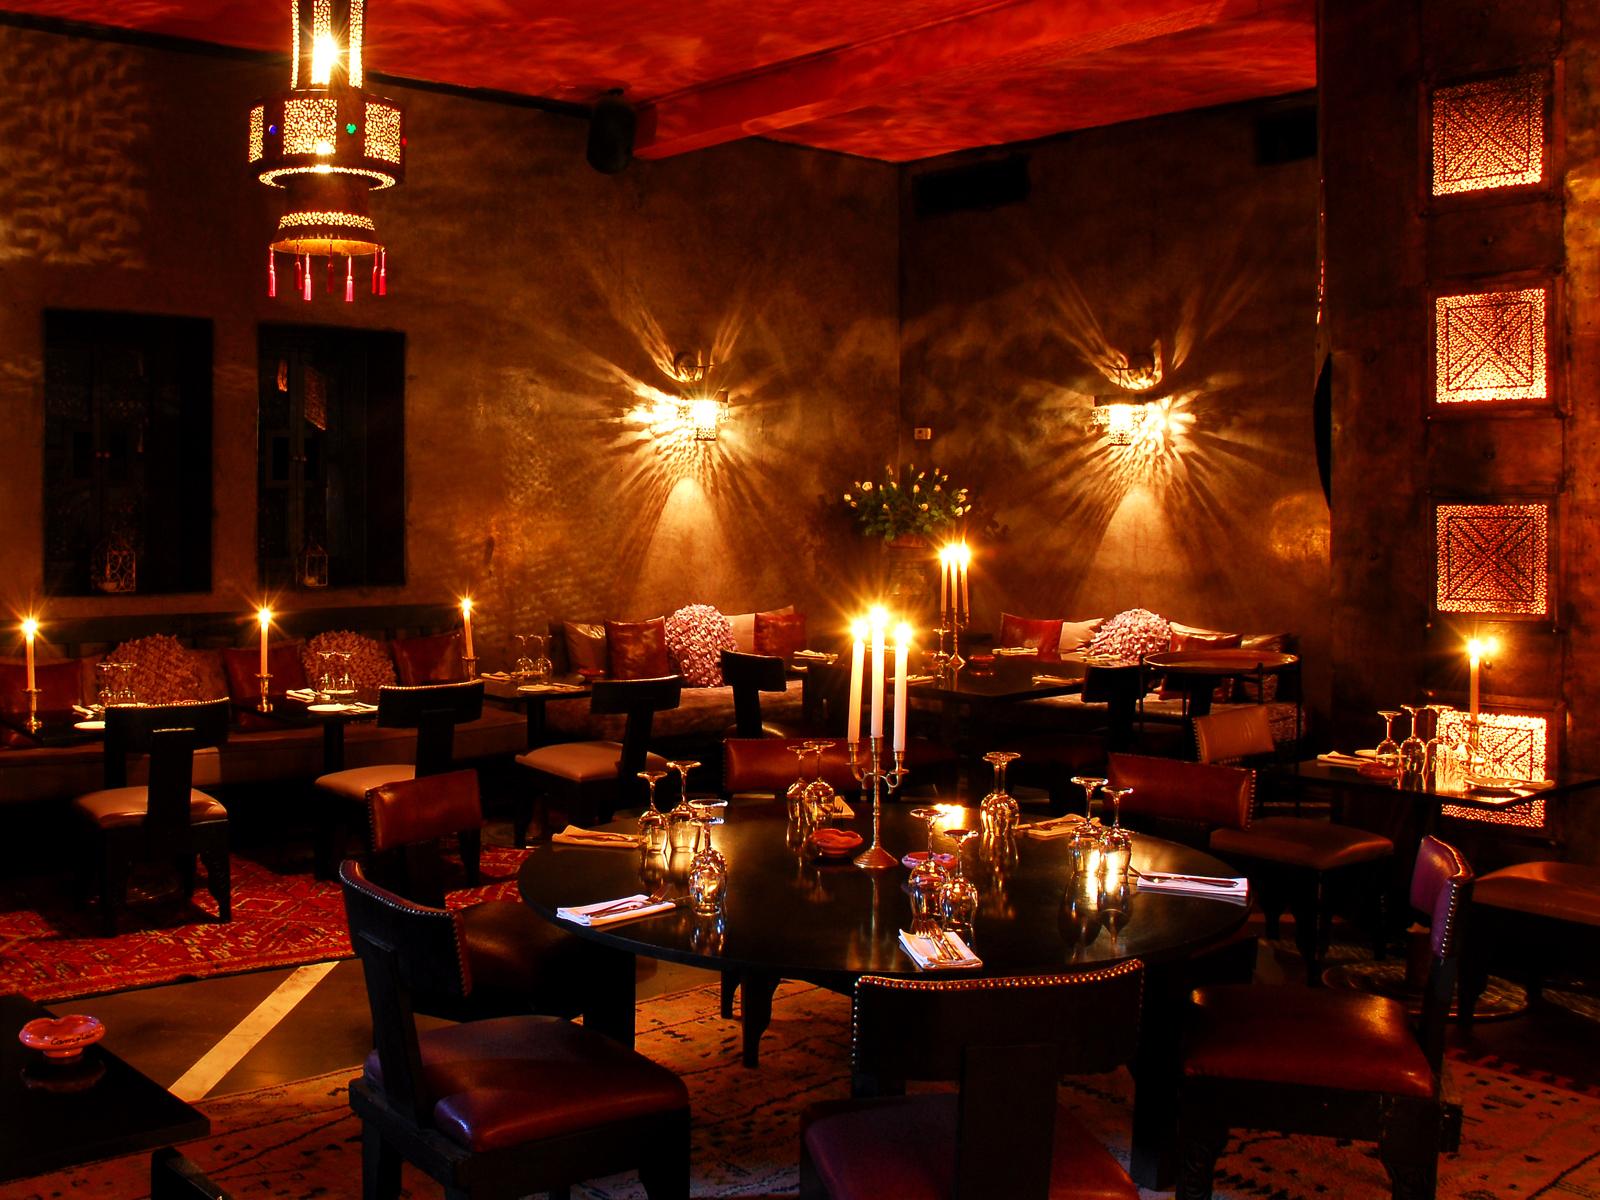 5 hotspots in marrakech - Le comptoir lounge magny le hongre ...